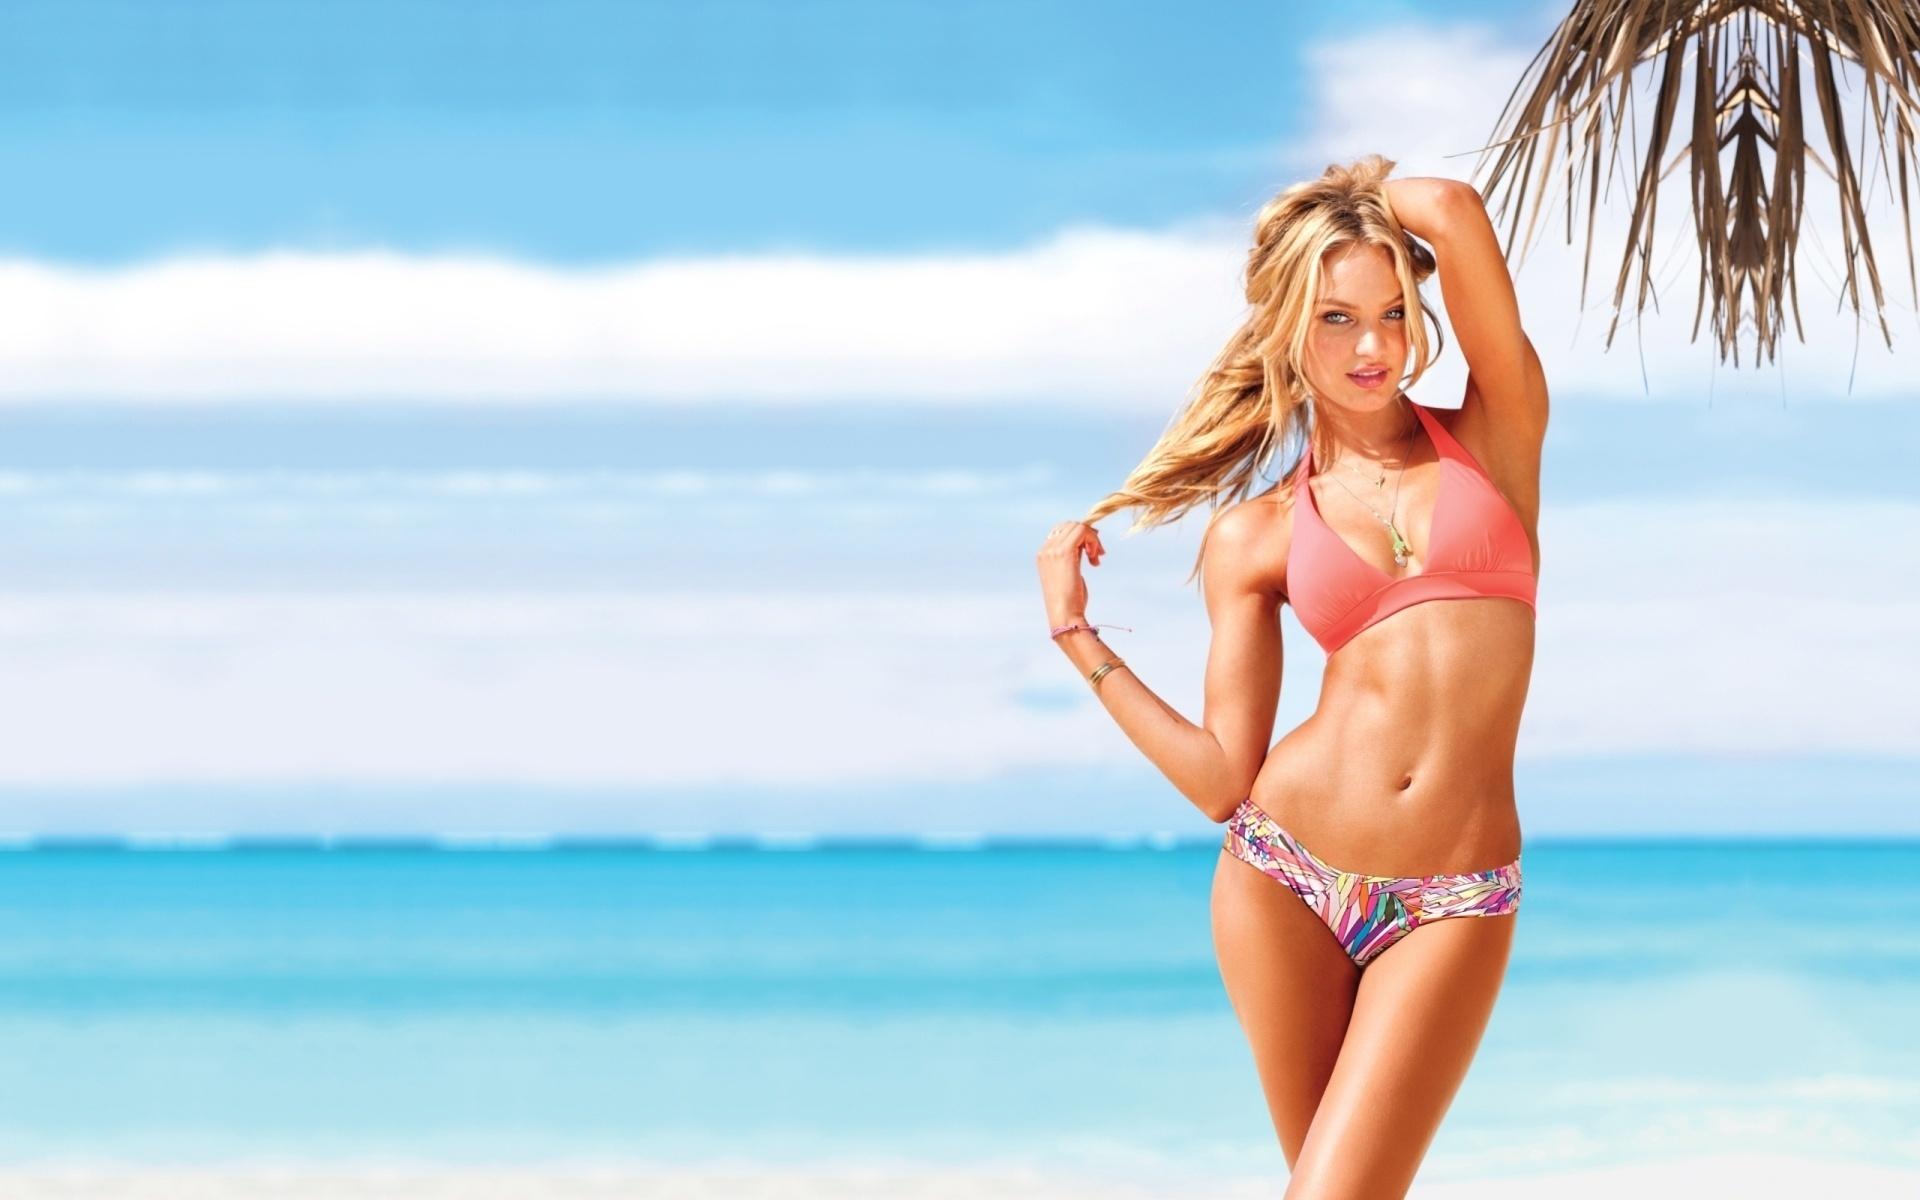 Кэндис свейнпол, девушка, красотка, candice swanepoel, модель